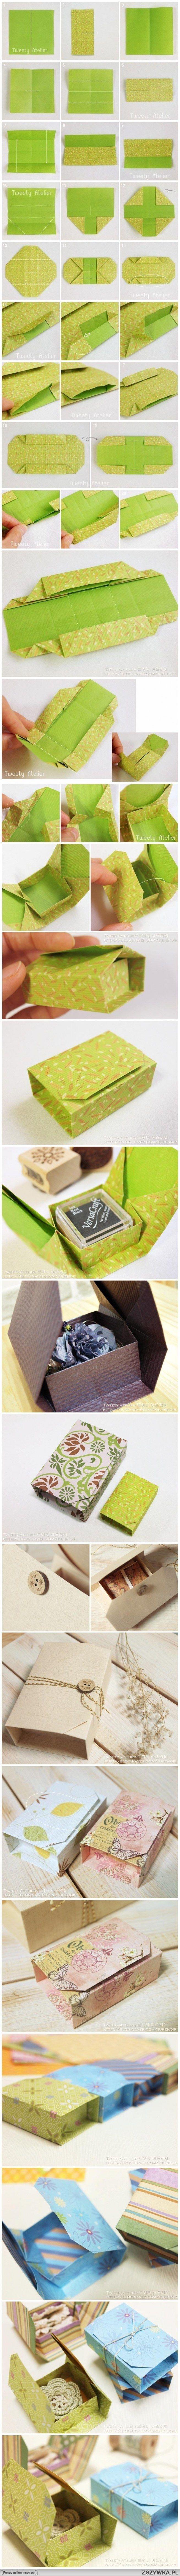 http://img.zszywka.pl/0/0160/w_8857/DIY-Zrob-to-sam/oorigamigift-box.jpg